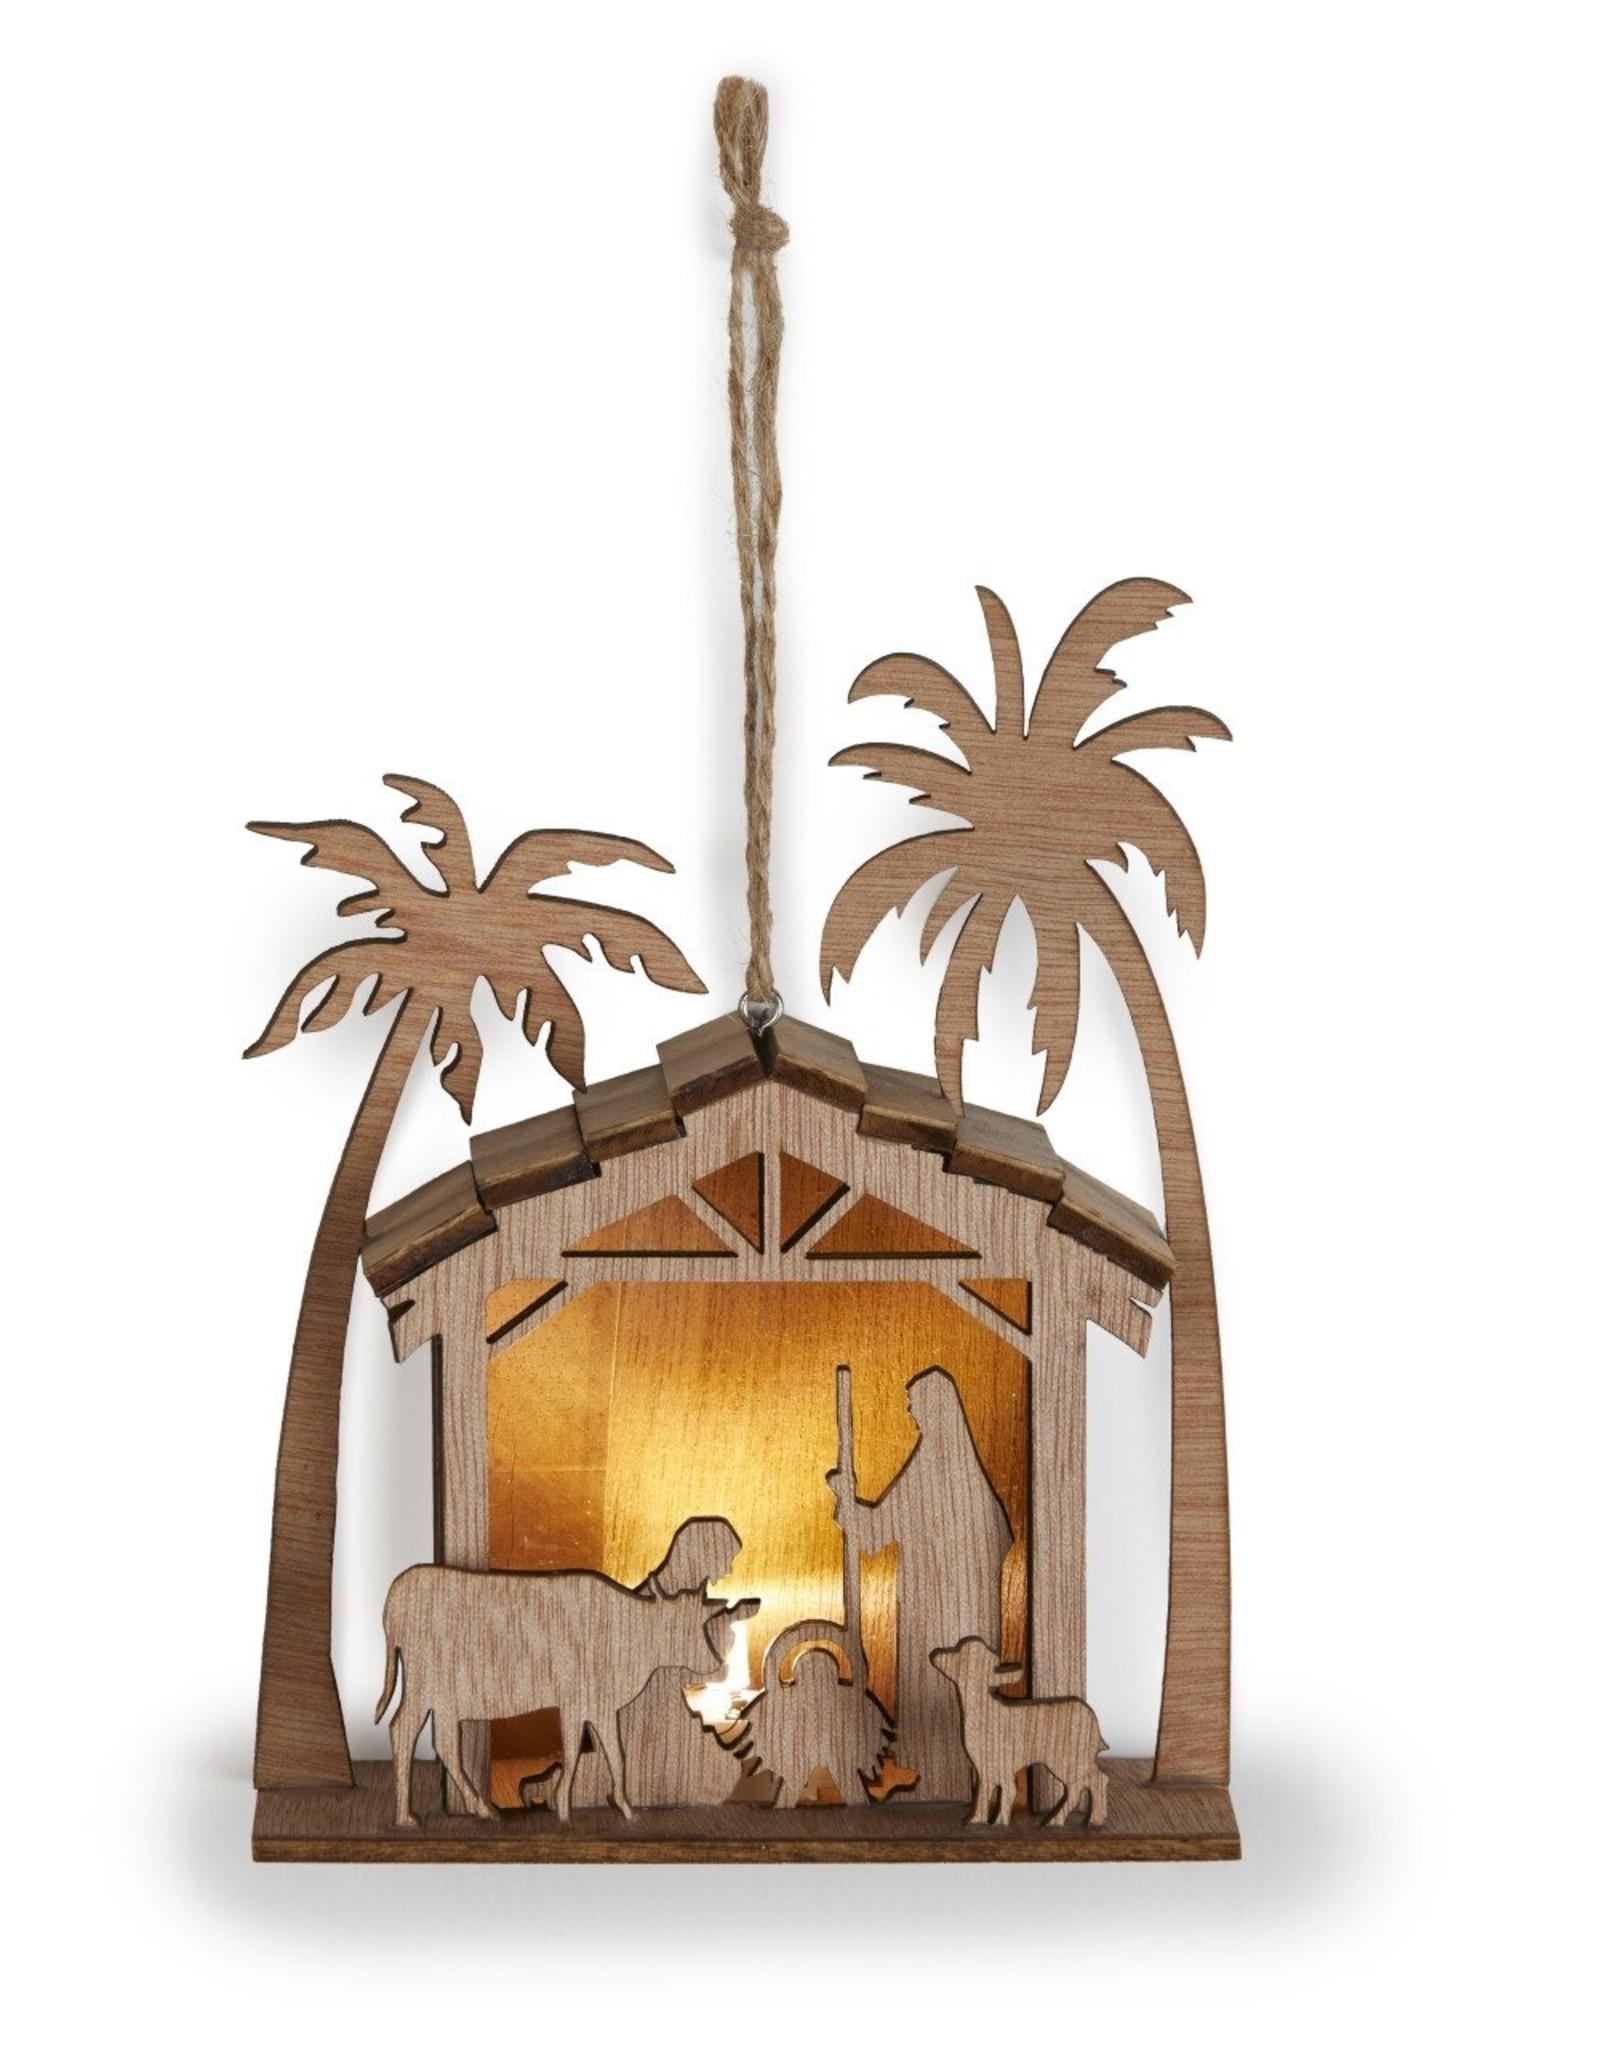 Demdaco Wooden Star Nativity Ornament - Light up!